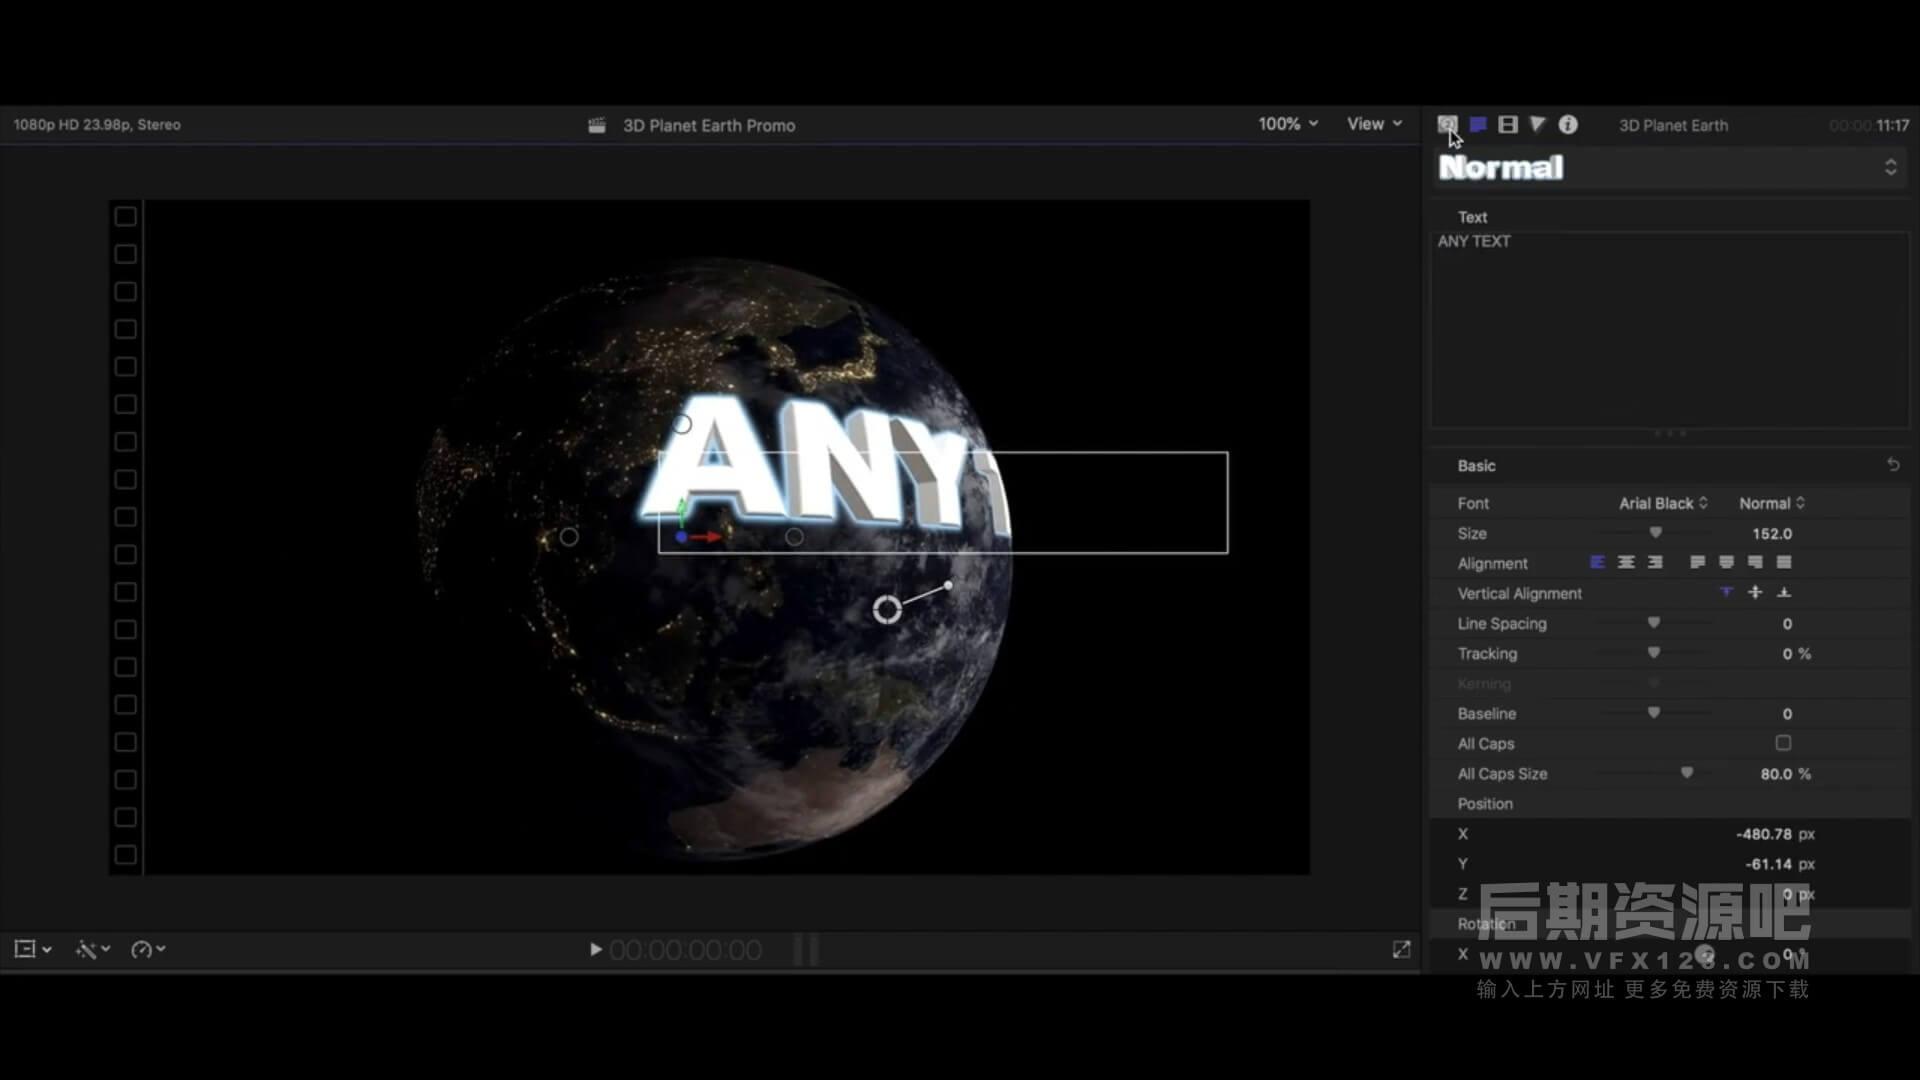 fcpx插件 3D地球旋转环绕标题动画生成工具 3D Planet Earth